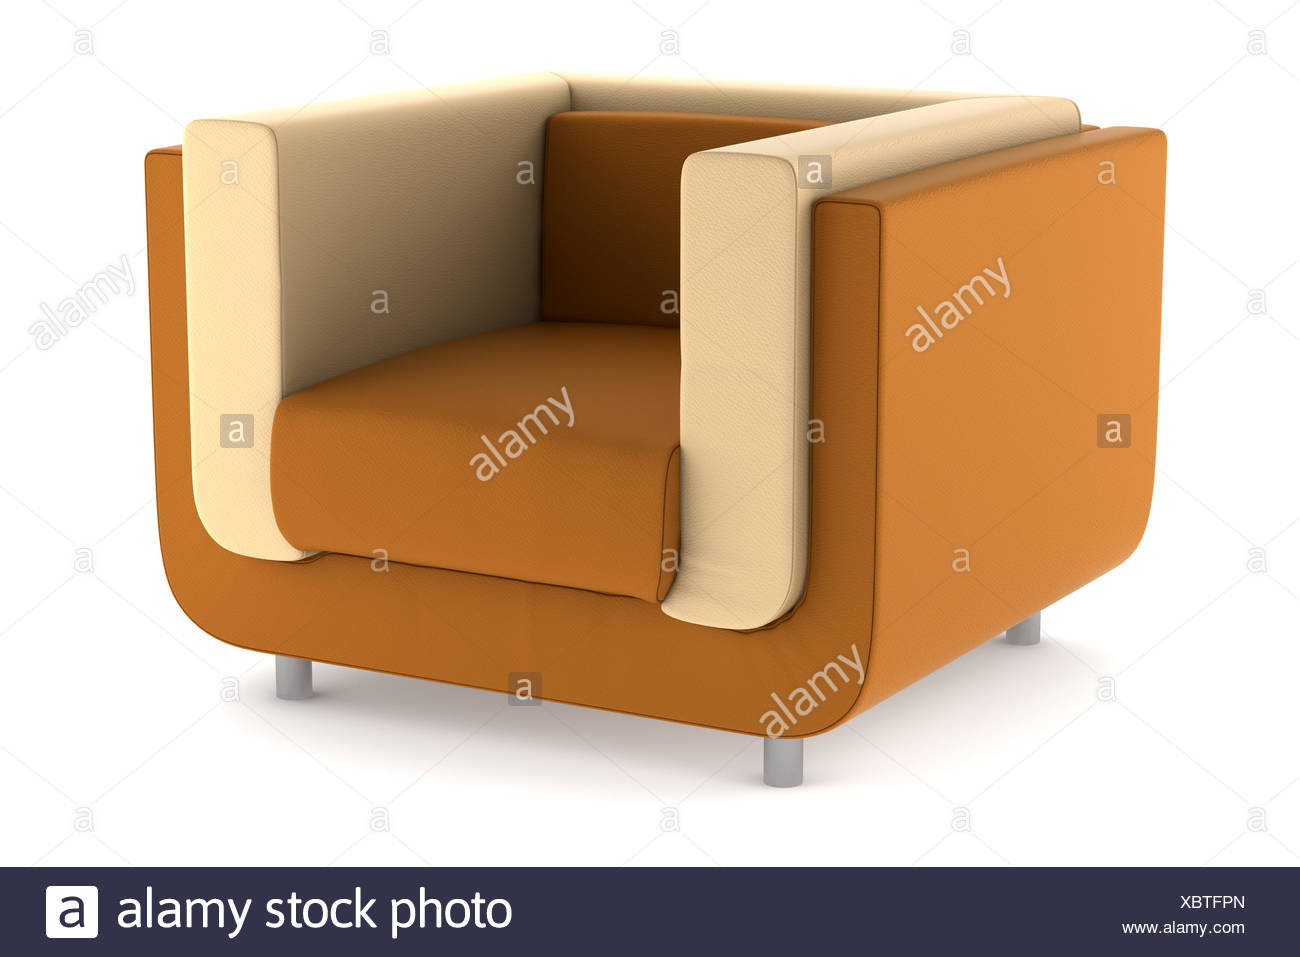 Pleasing Modern Orange Leather Armchair Isolated On White Stock Photo Machost Co Dining Chair Design Ideas Machostcouk